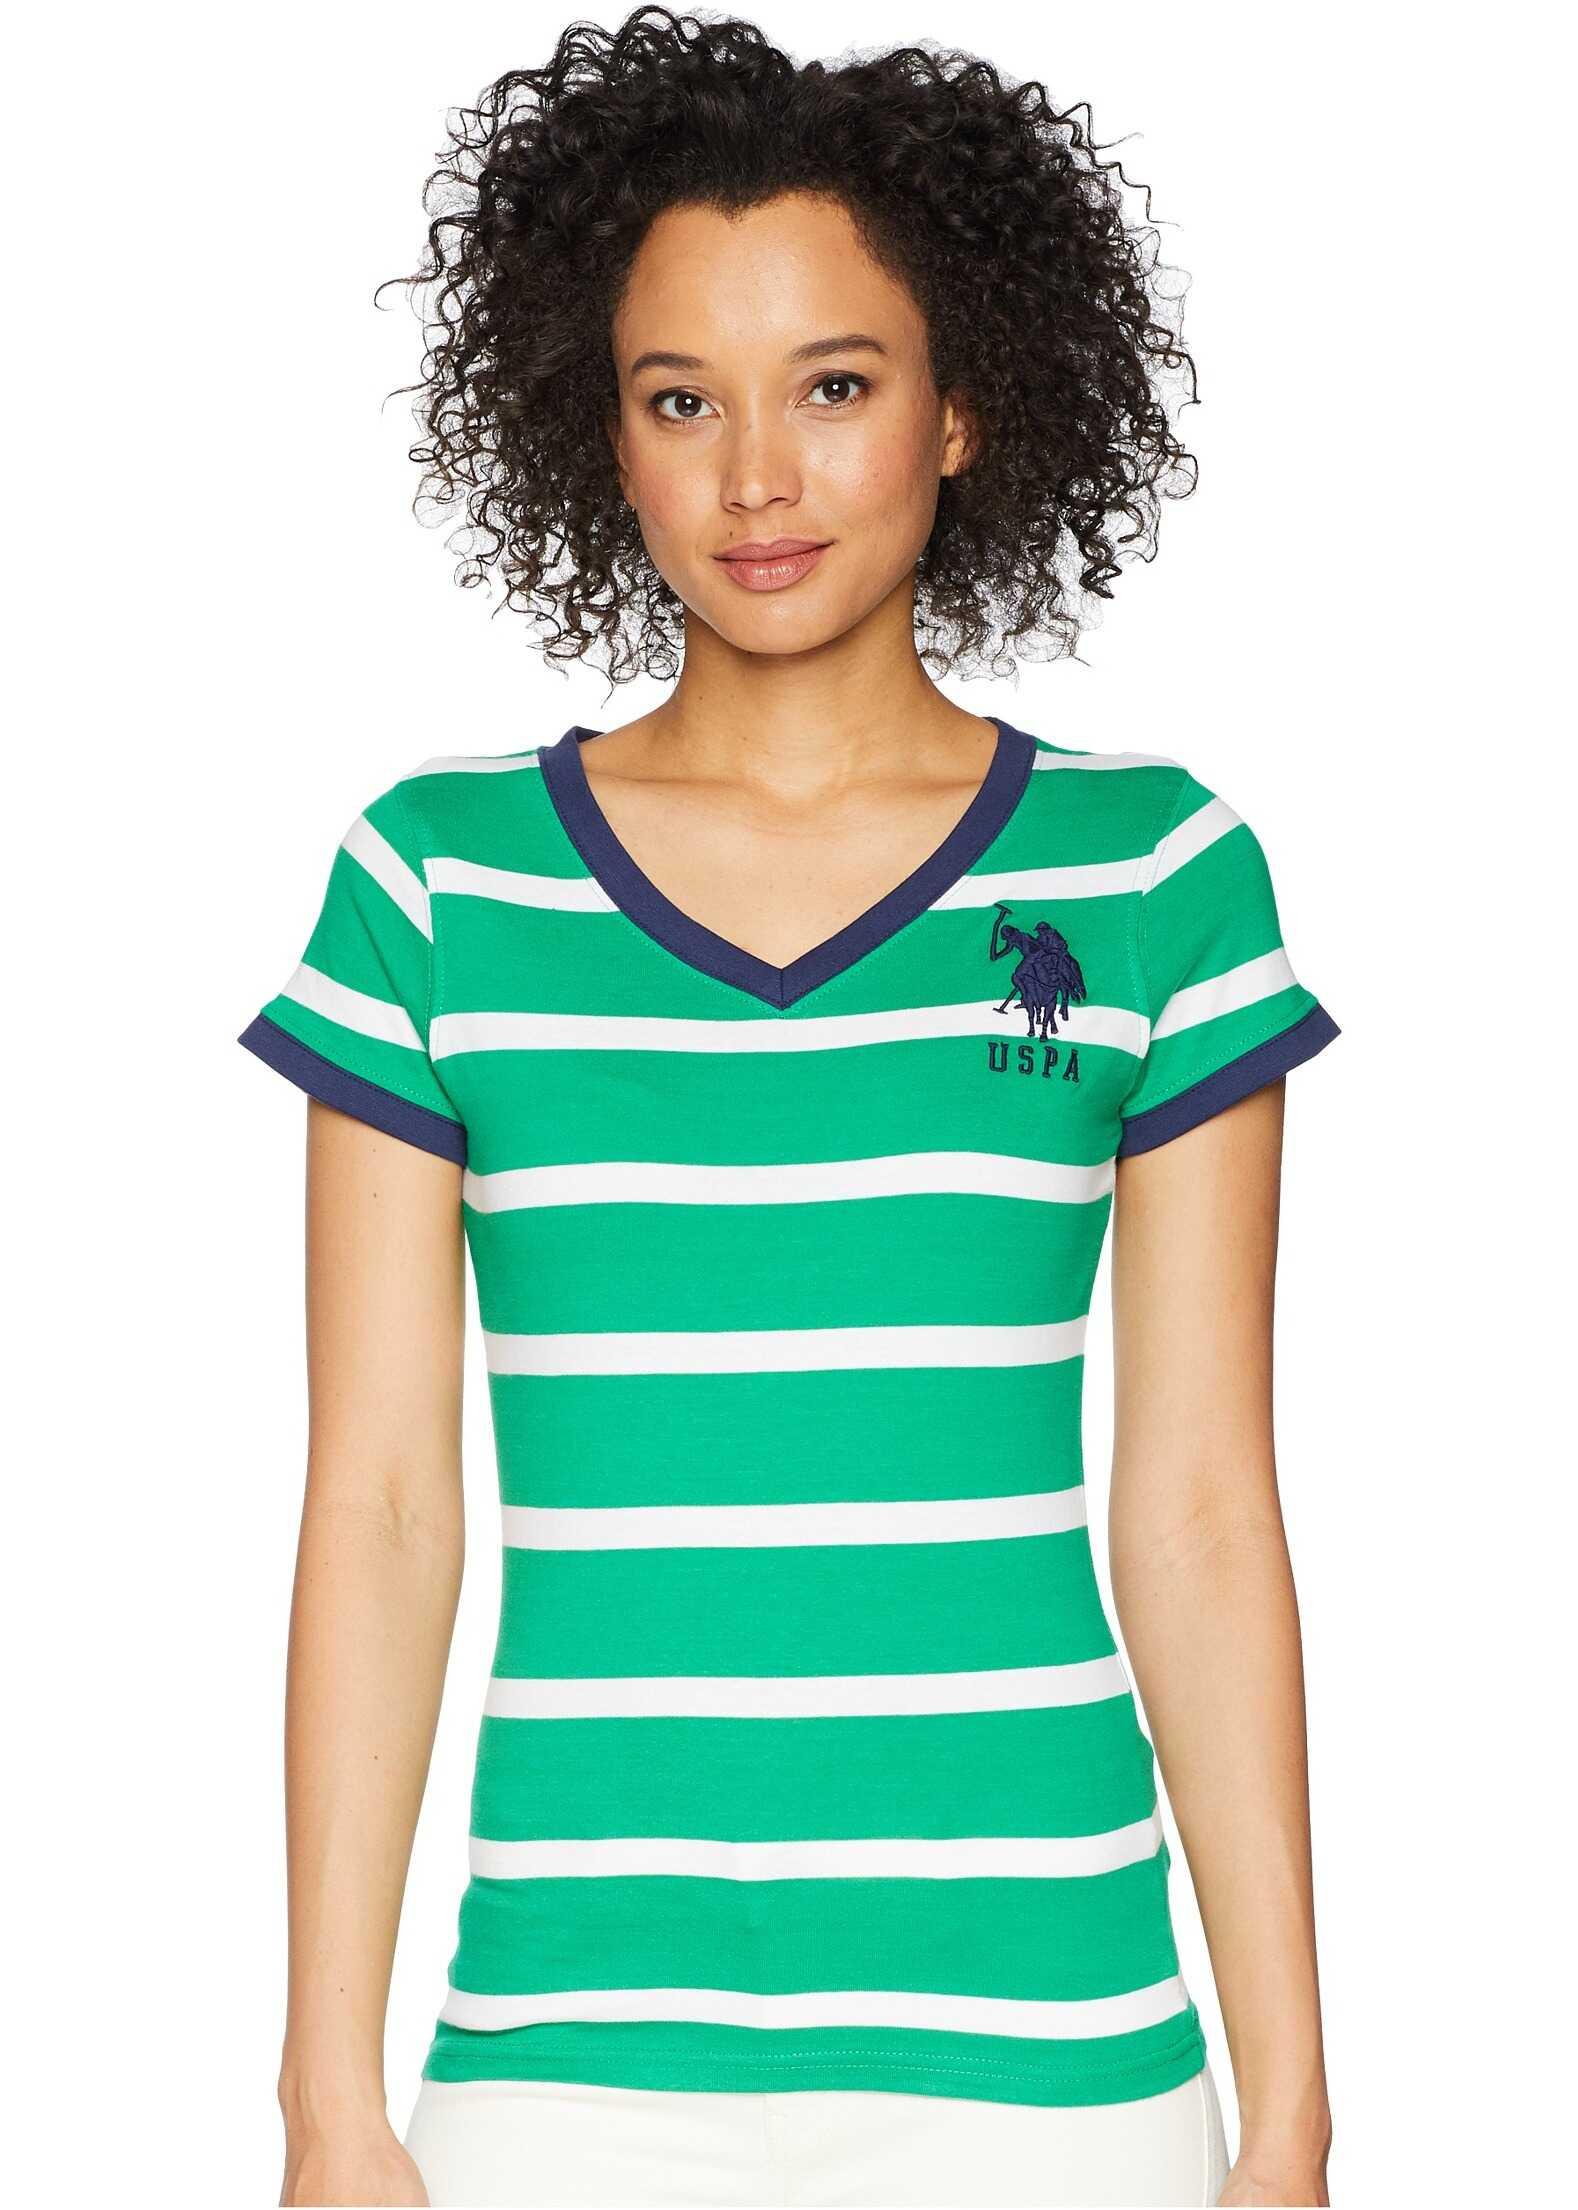 U.S. POLO ASSN. Short Sleeve Striped V-Neck T-Shirt Ivy Green